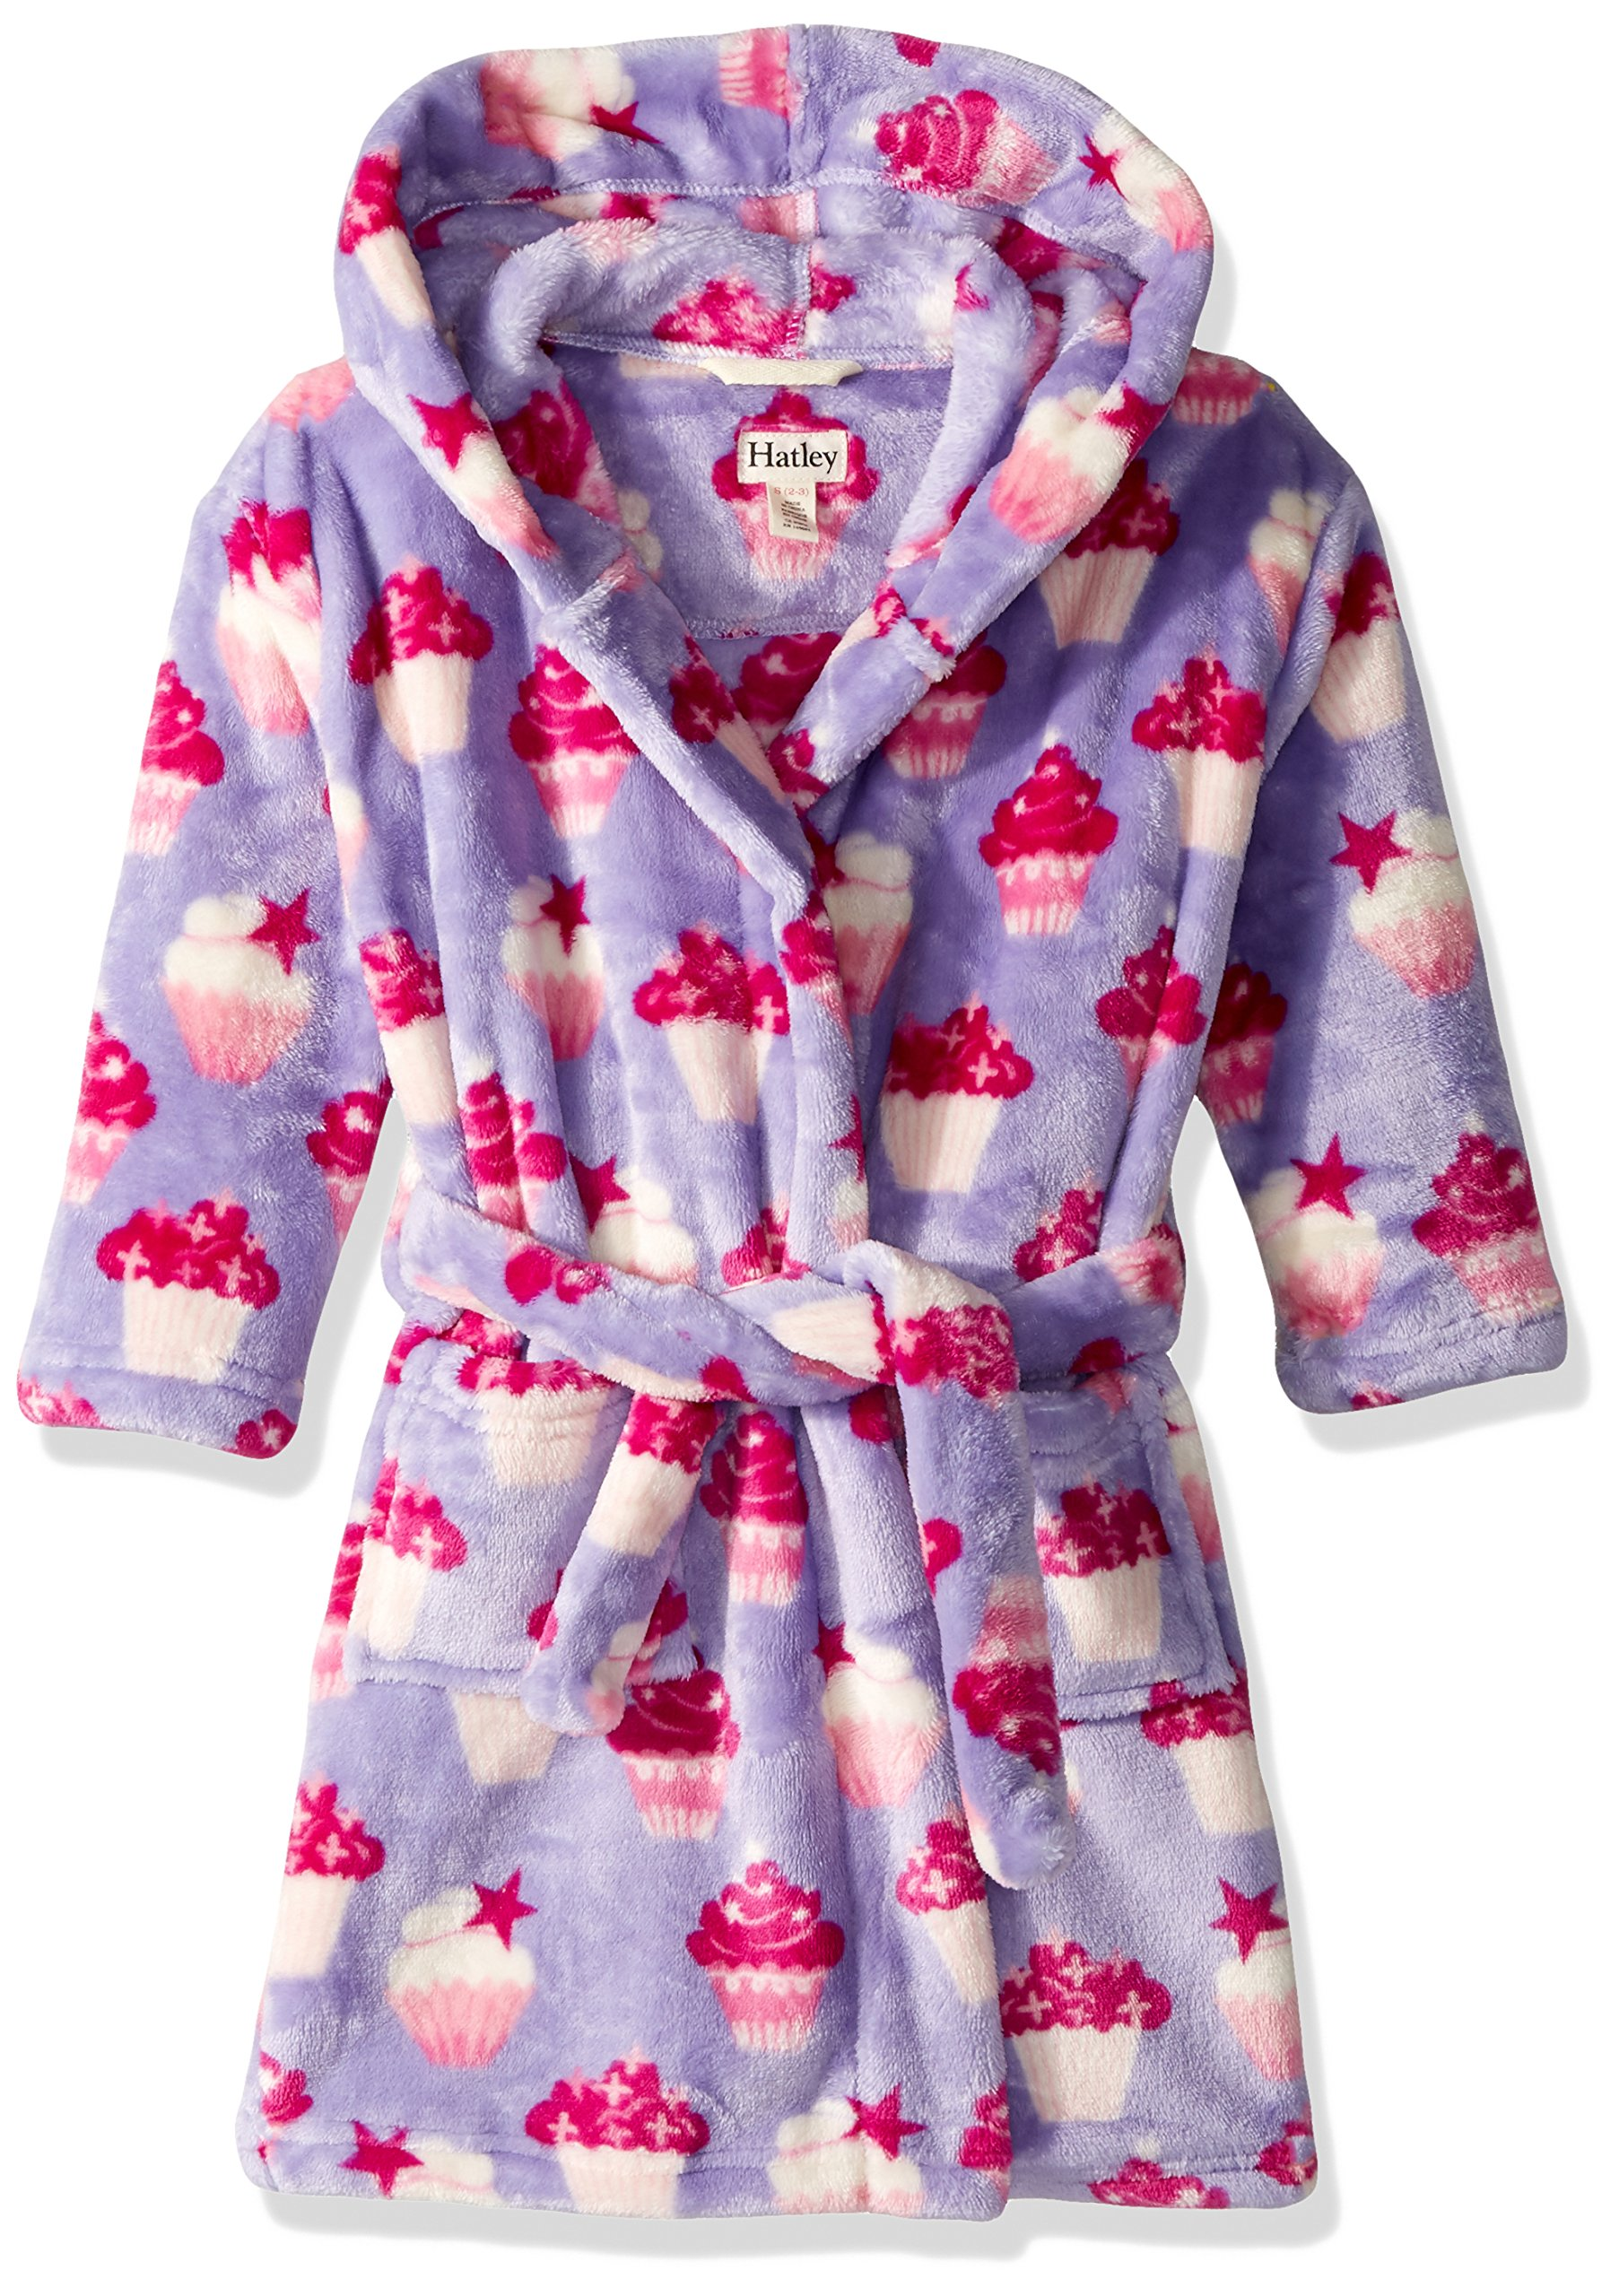 Hatley Girls' Little Fuzzy Fleece Robes, Yummy Cupcakes Small by Hatley (Image #1)